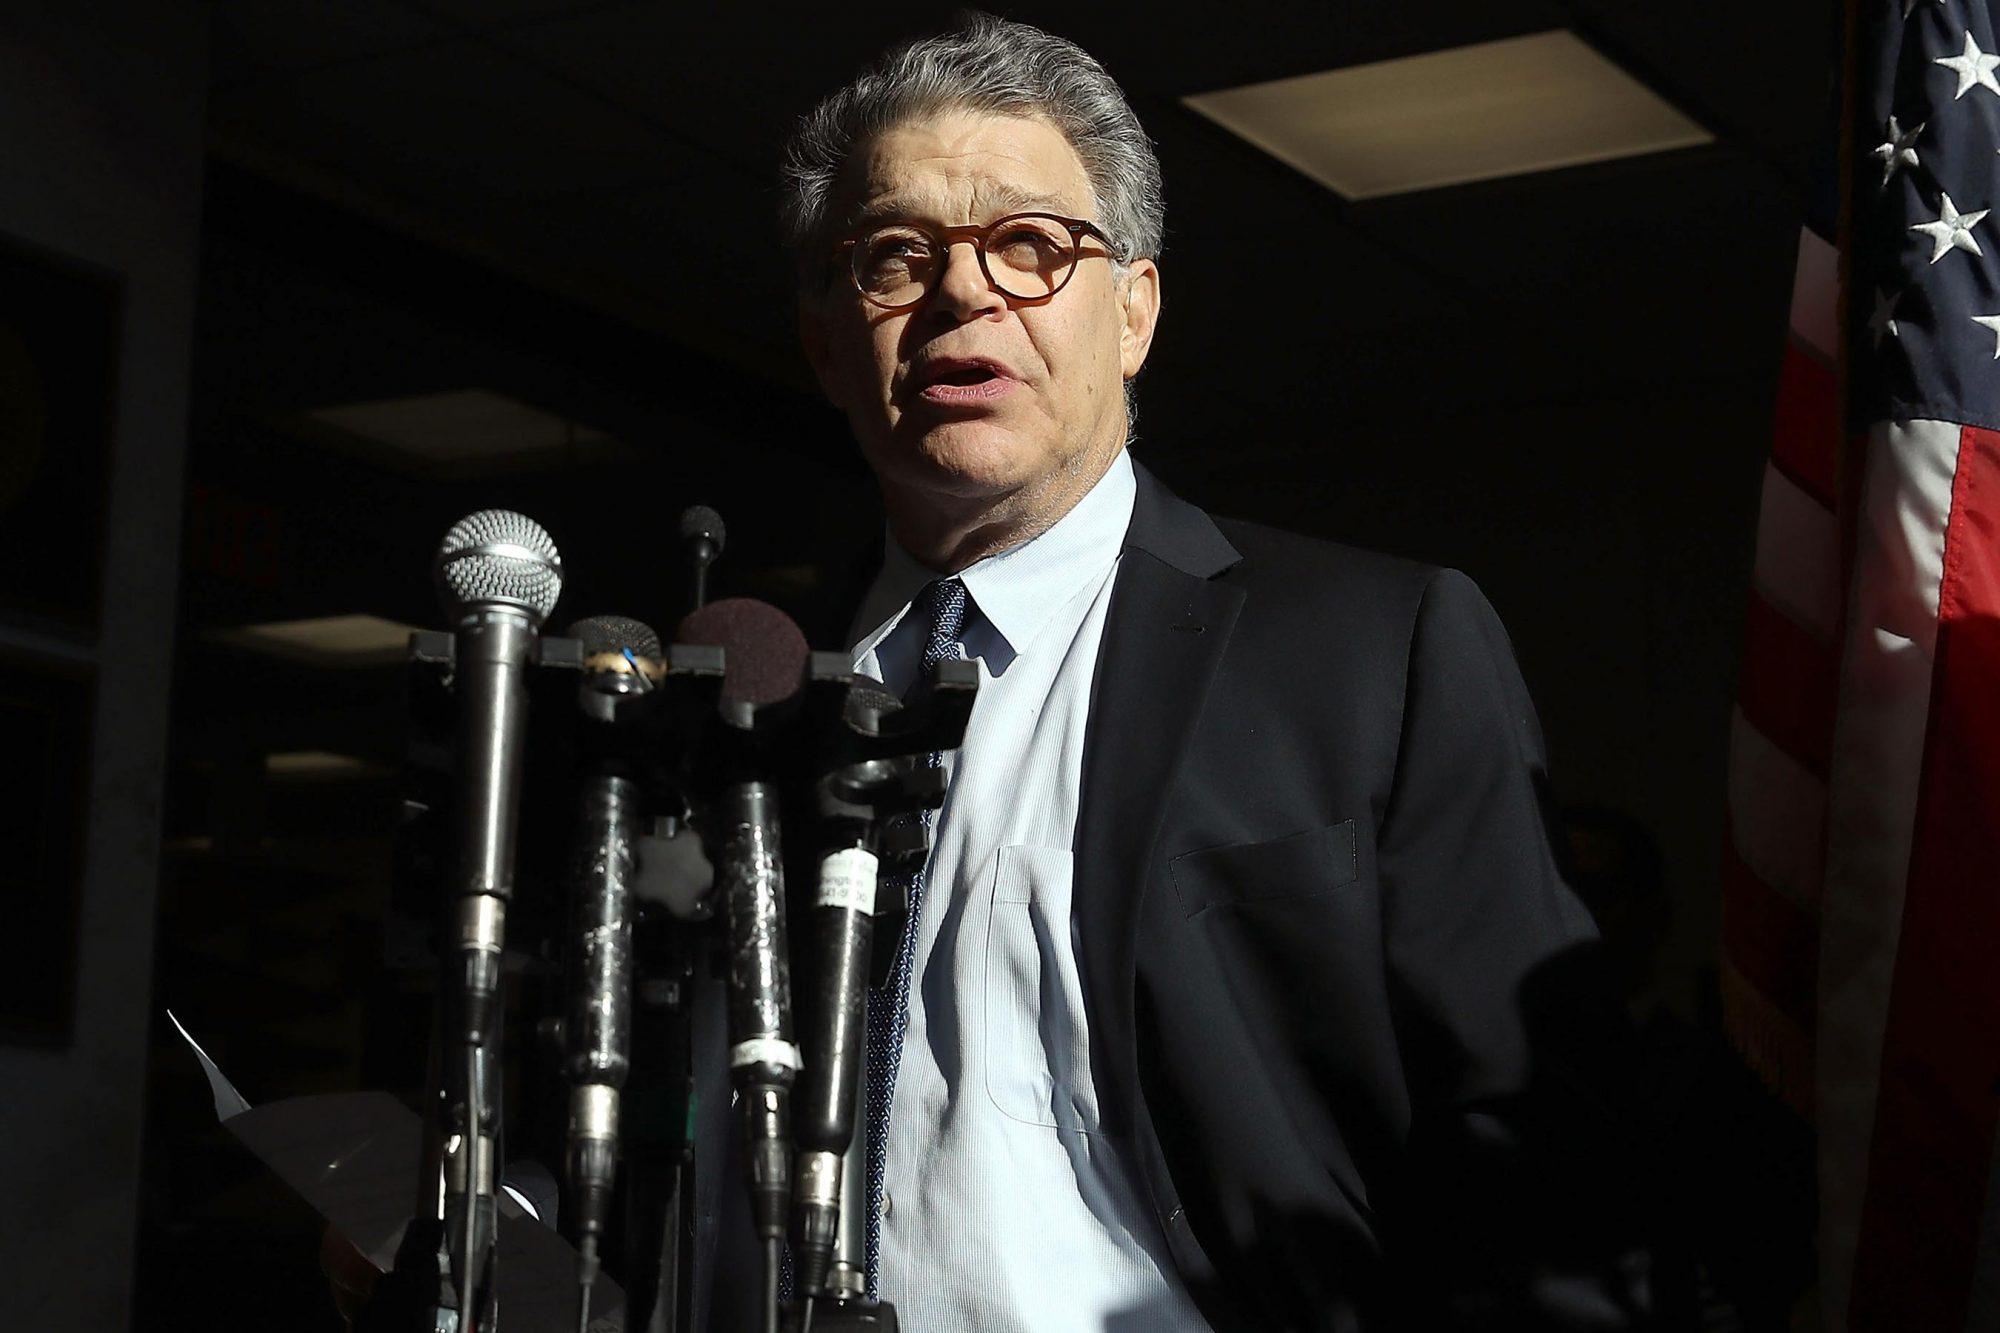 Sen. Al Franken Returns To Work On Capitol Hill After Sex Harrassment Claims